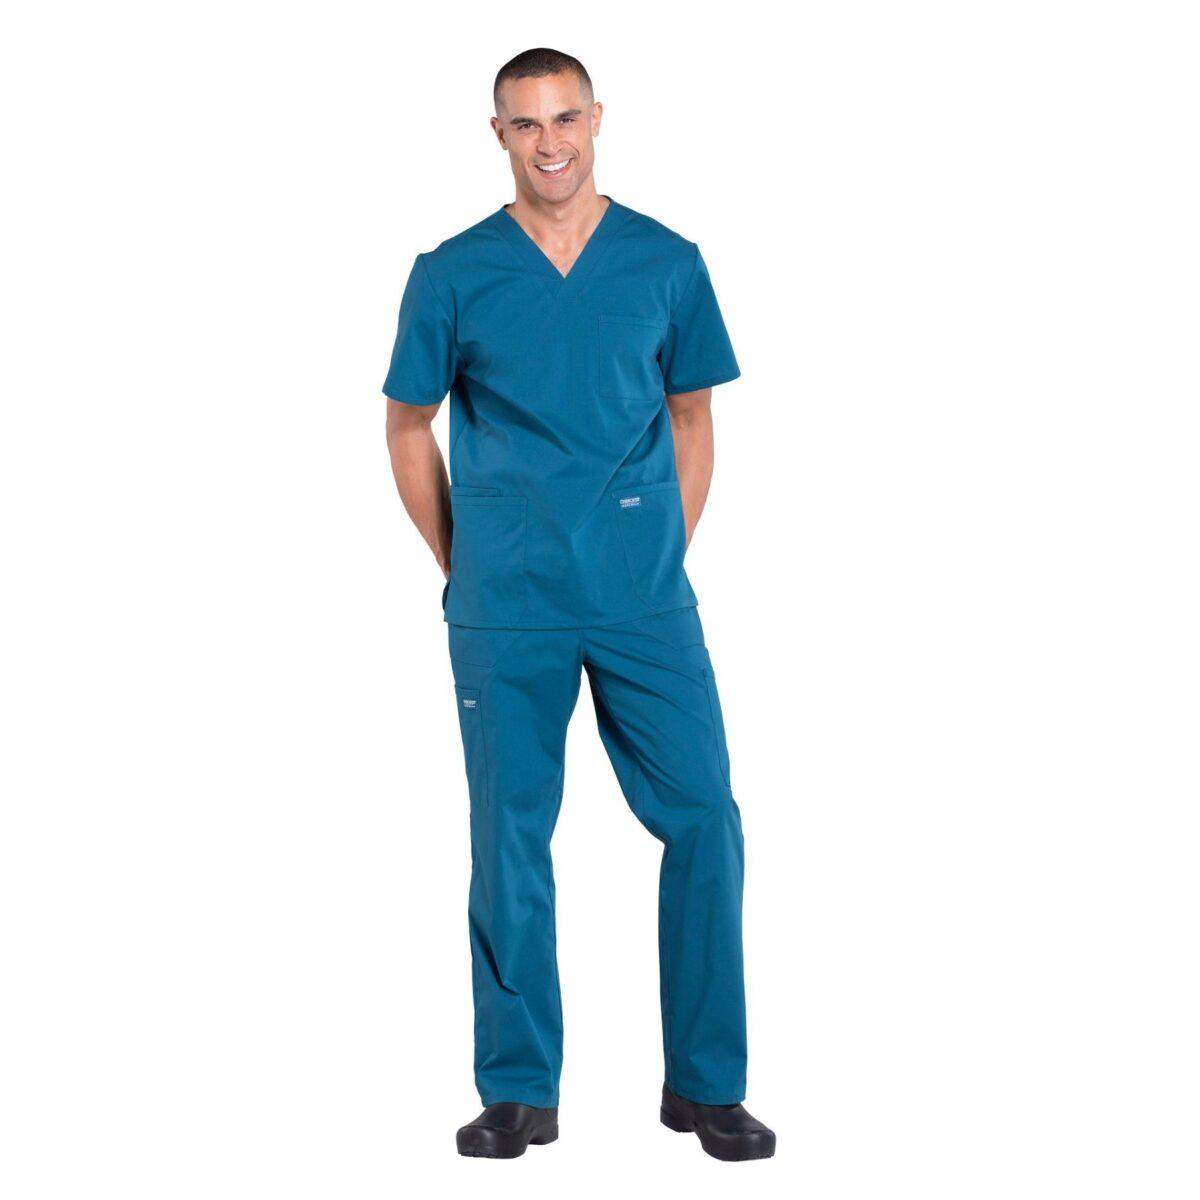 Мужской медицинский костюм Professionals цвет морская волна